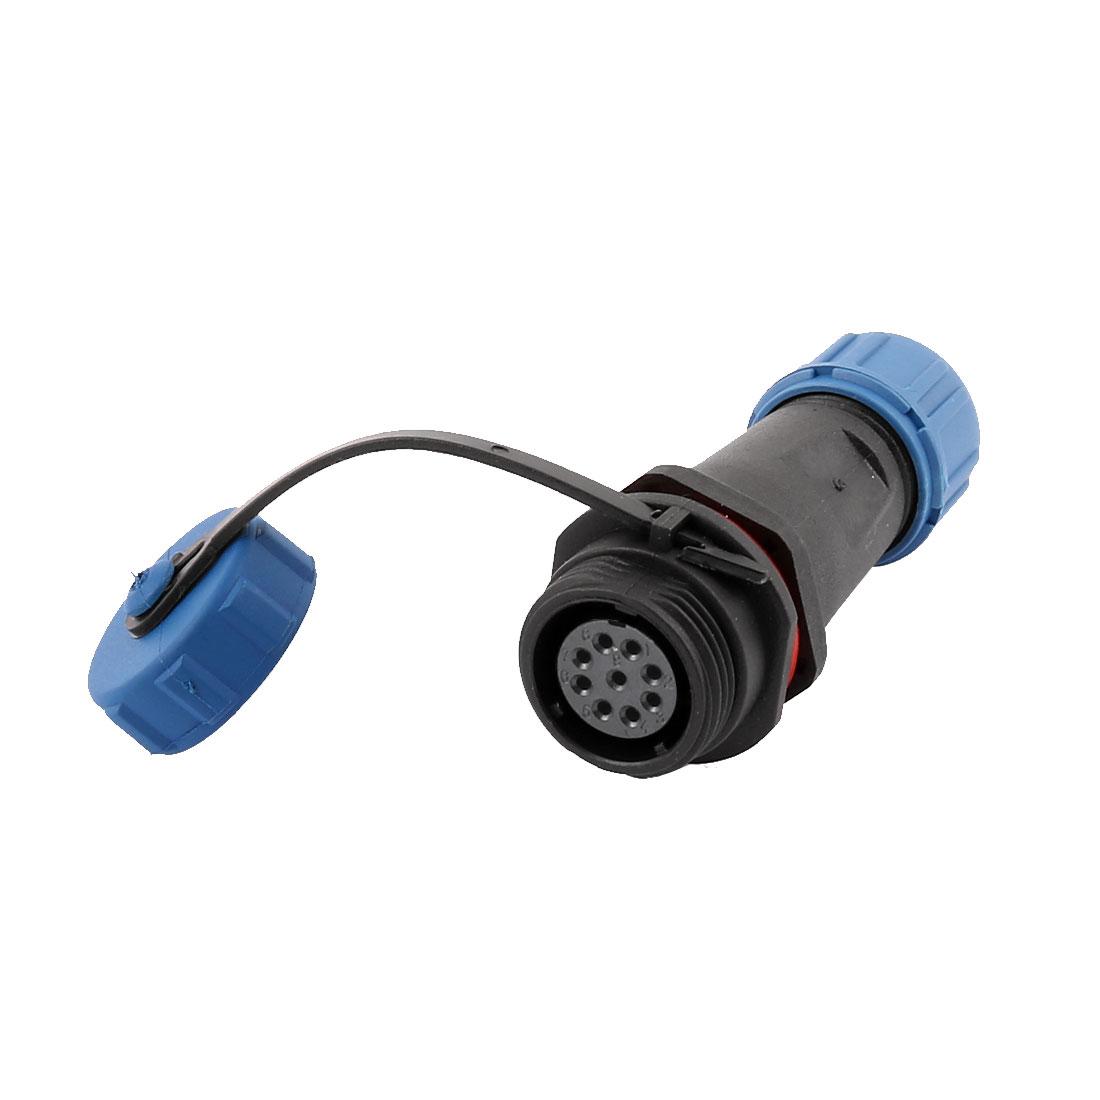 AC 500V 6 Terminals SP1311/S Waterproof Aviation Socket Dustproof Adapter Connector